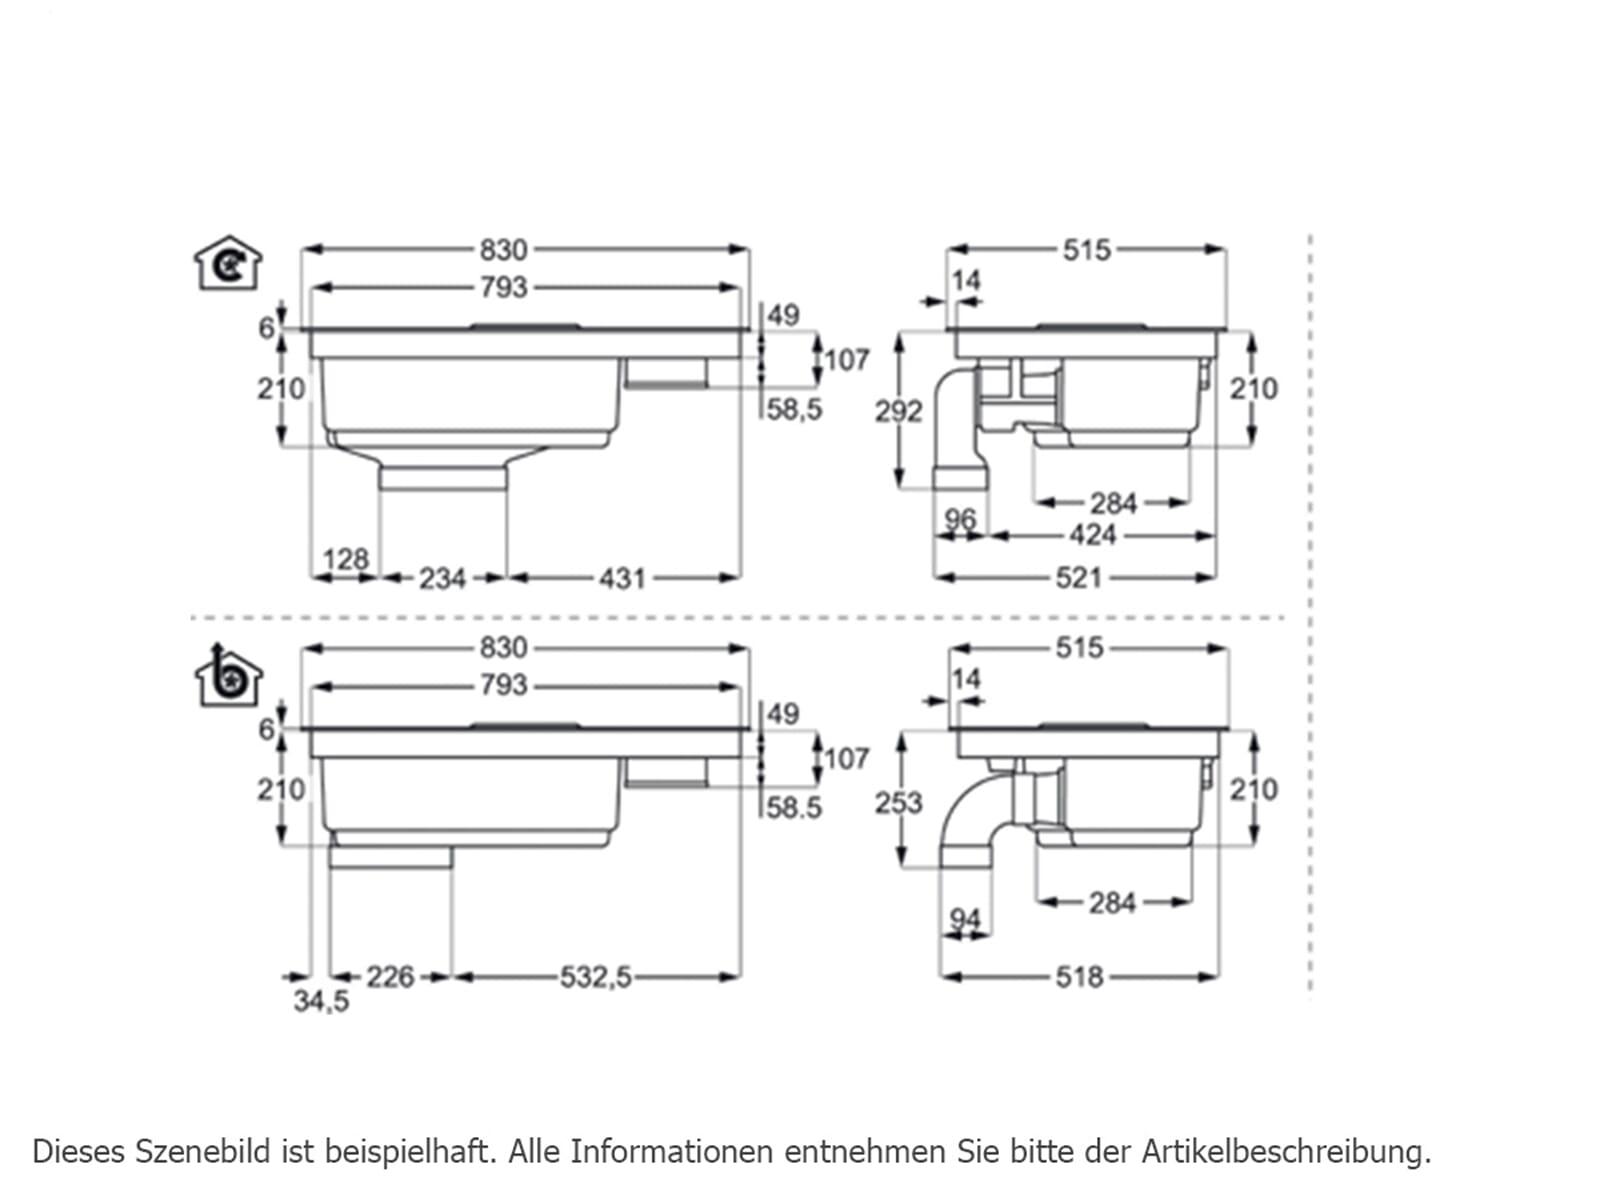 aeg ide84242i b induktion kochfeld dunstabzug kombination kochfeldabzug ebay. Black Bedroom Furniture Sets. Home Design Ideas